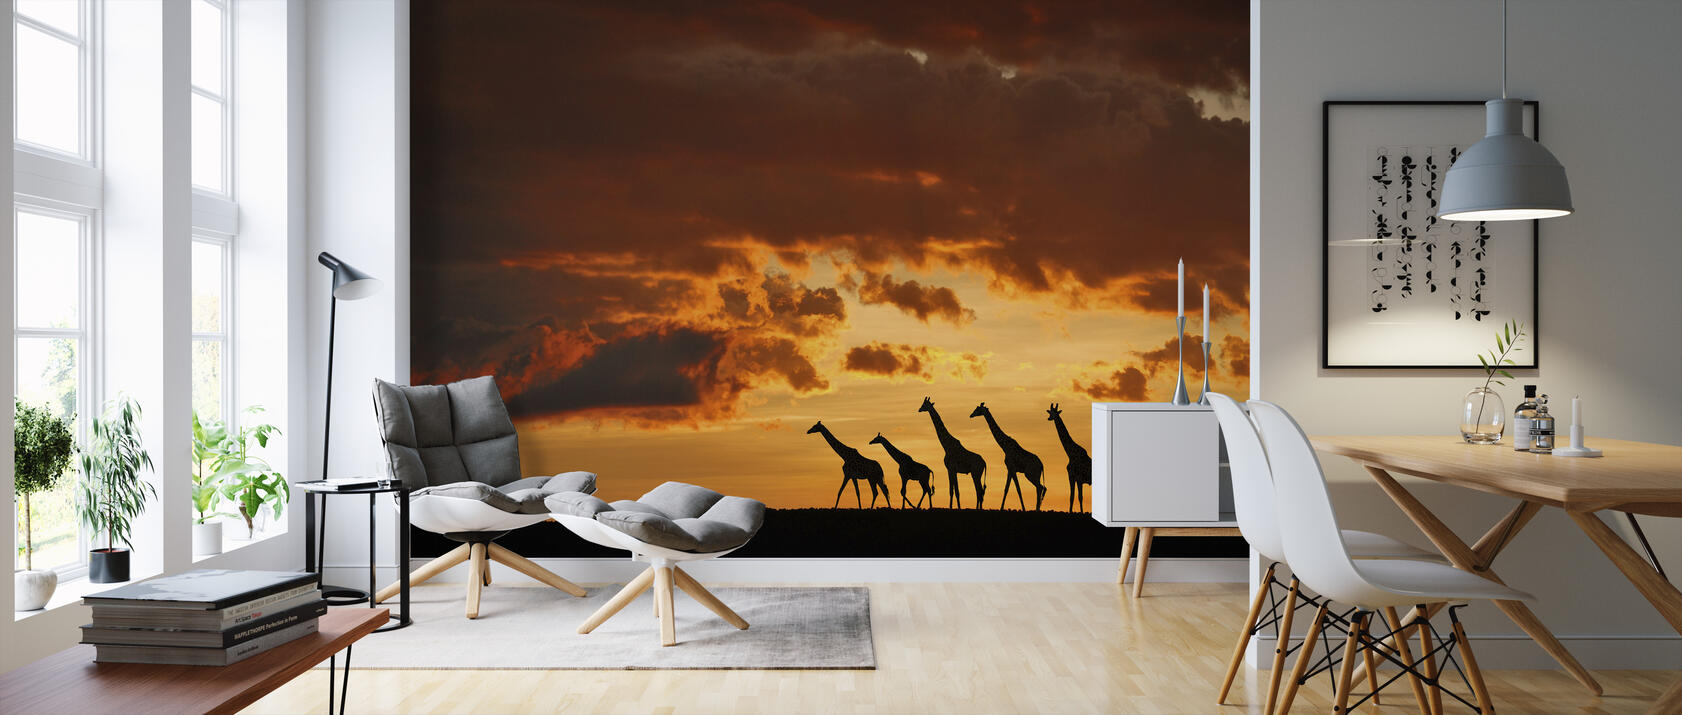 five giraffes eine fototapete f r jeden raum photowall. Black Bedroom Furniture Sets. Home Design Ideas